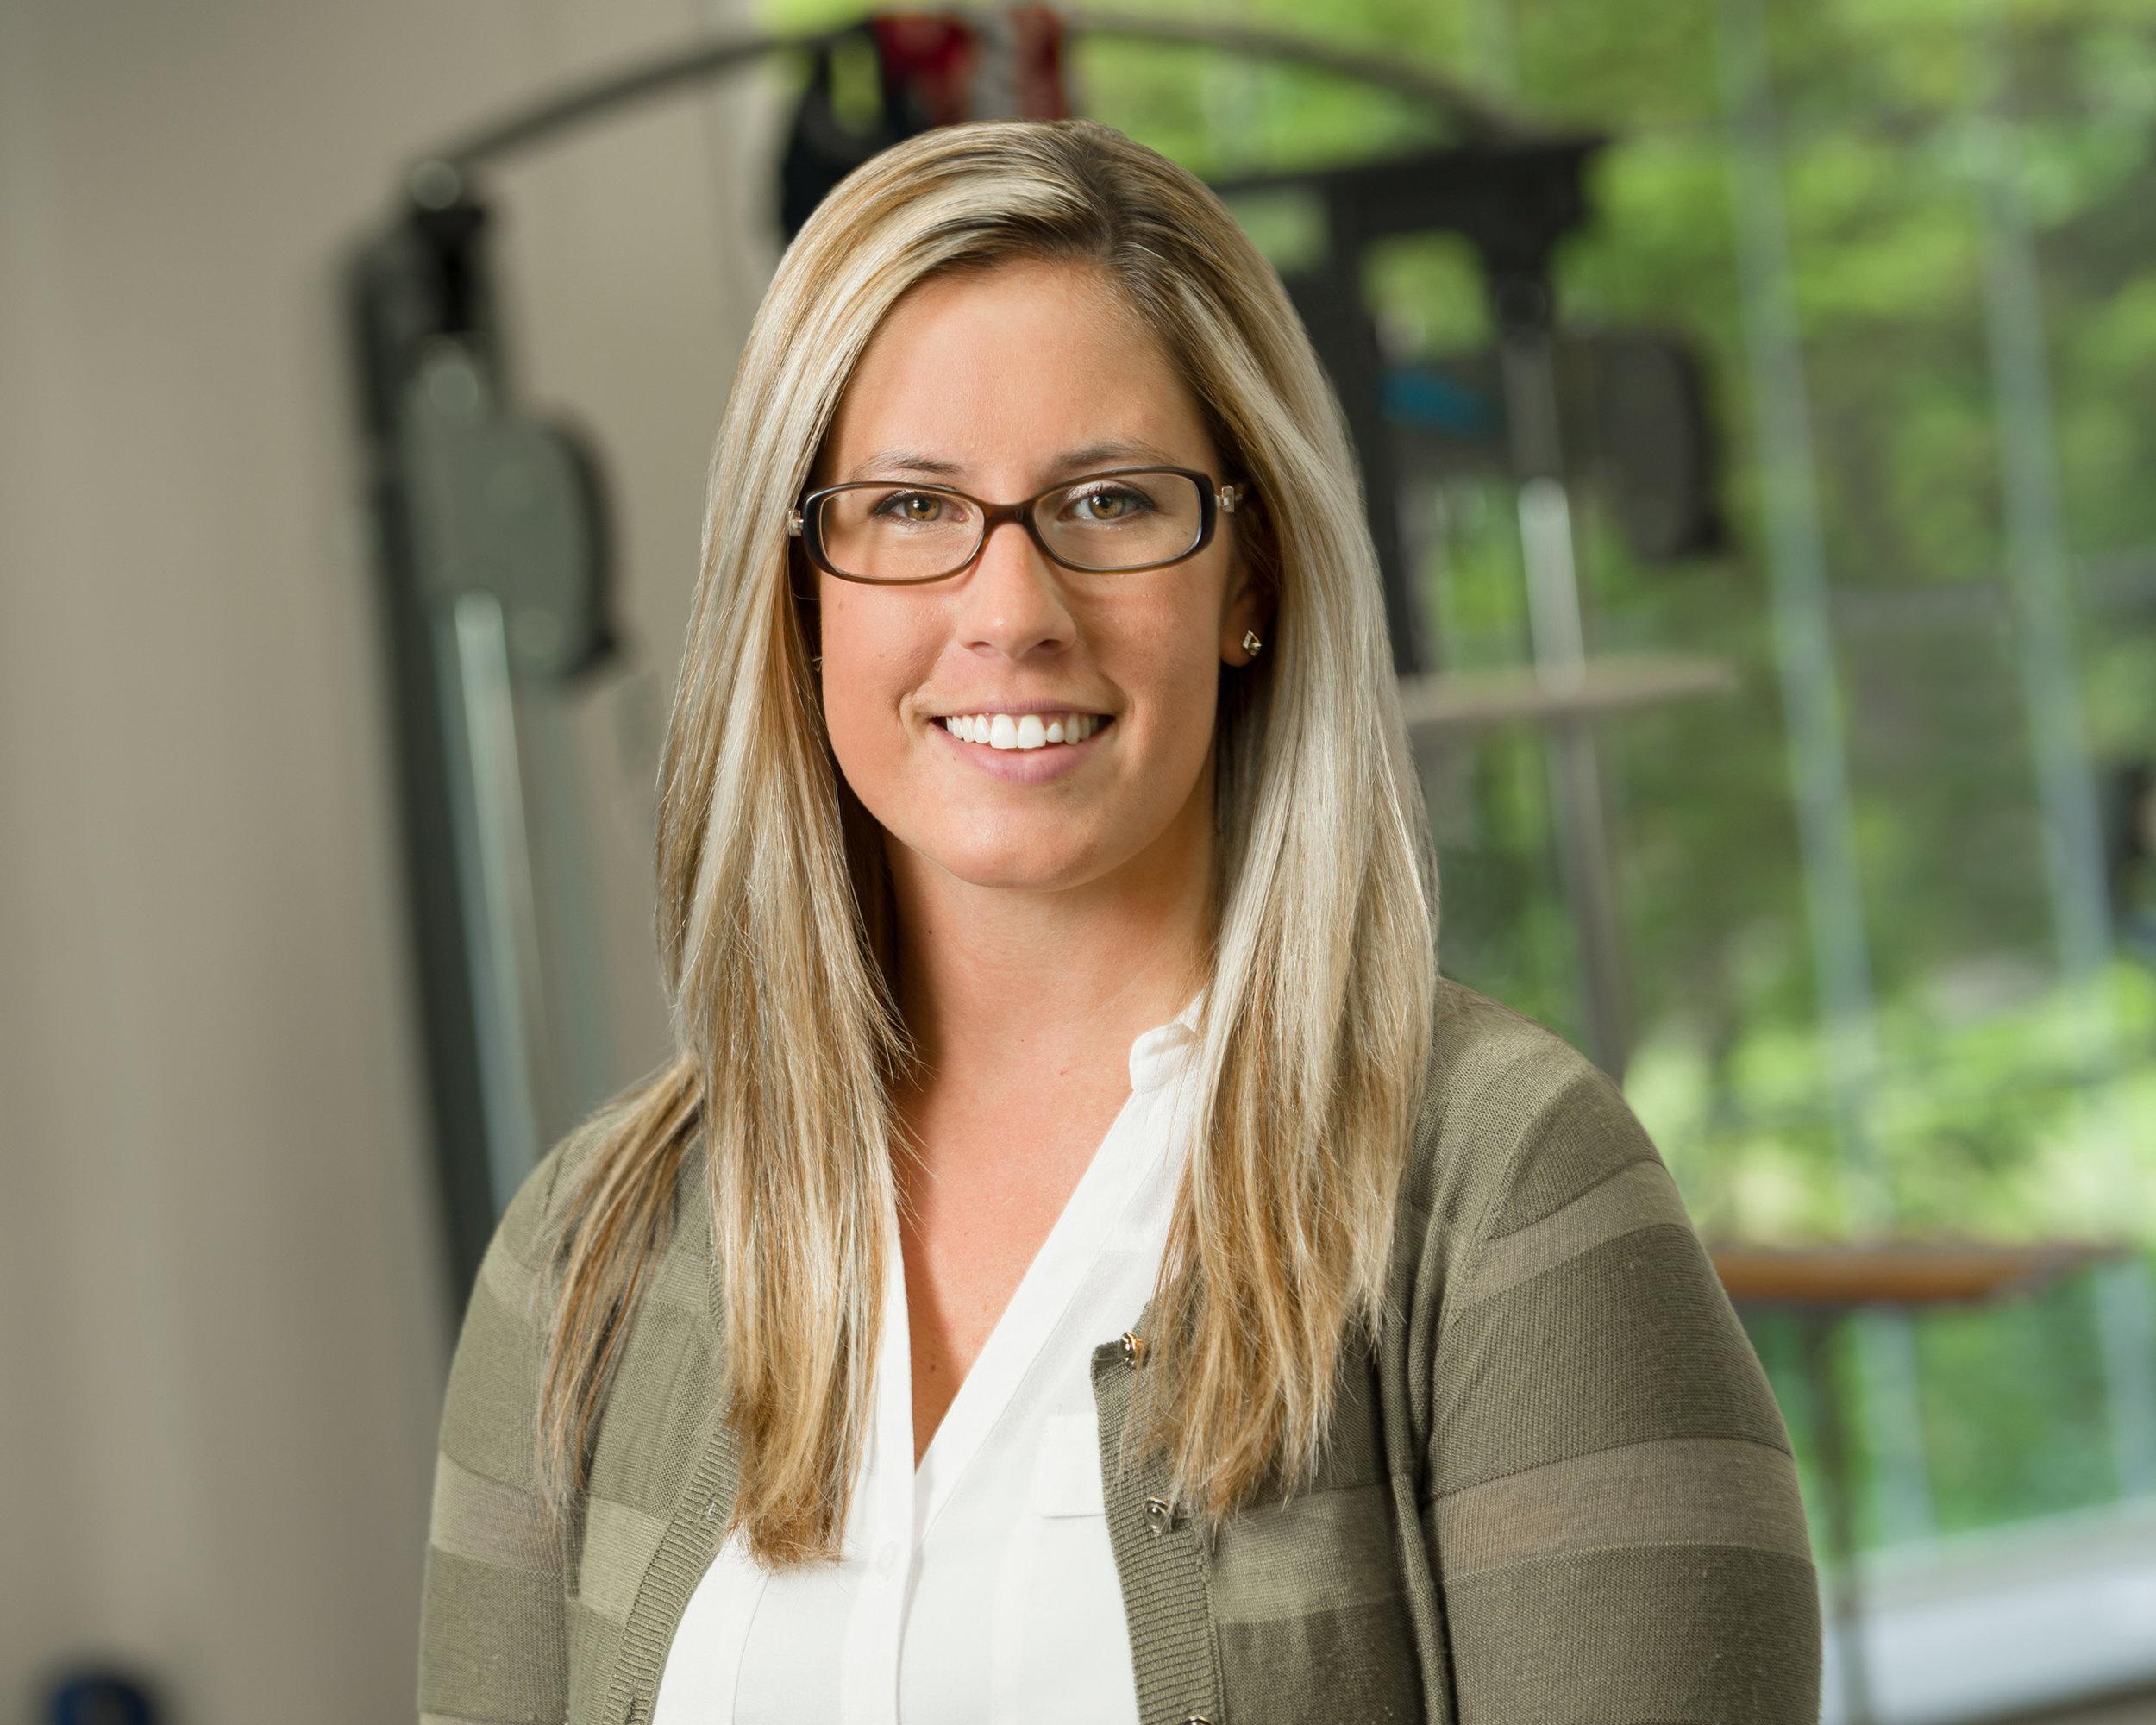 Lattimore Physical Therapist Eileen Kurtenbach